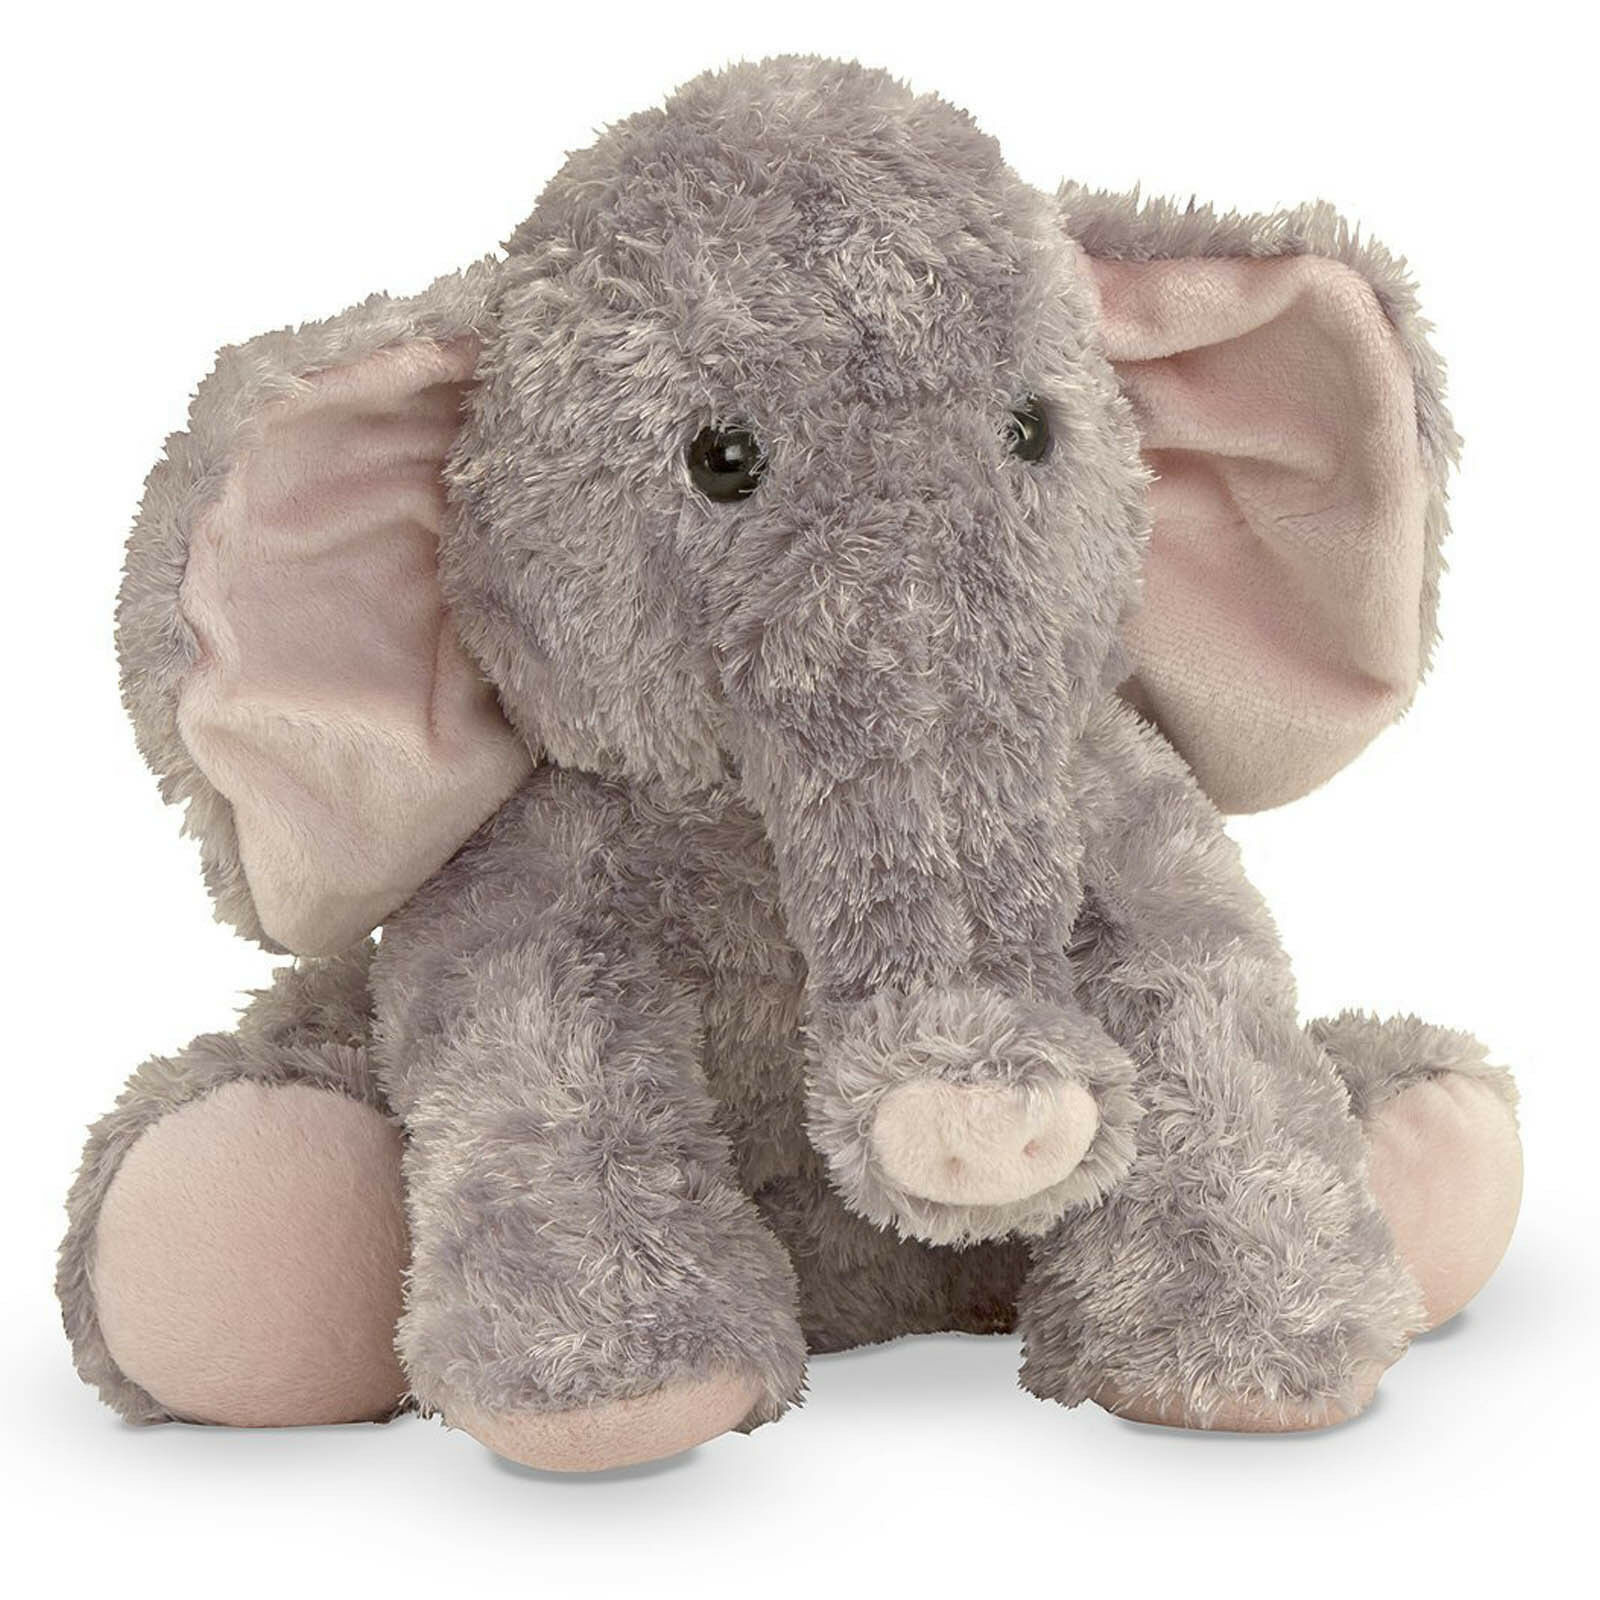 Melissa & Doug Sterling Elephant Stuffed Animal